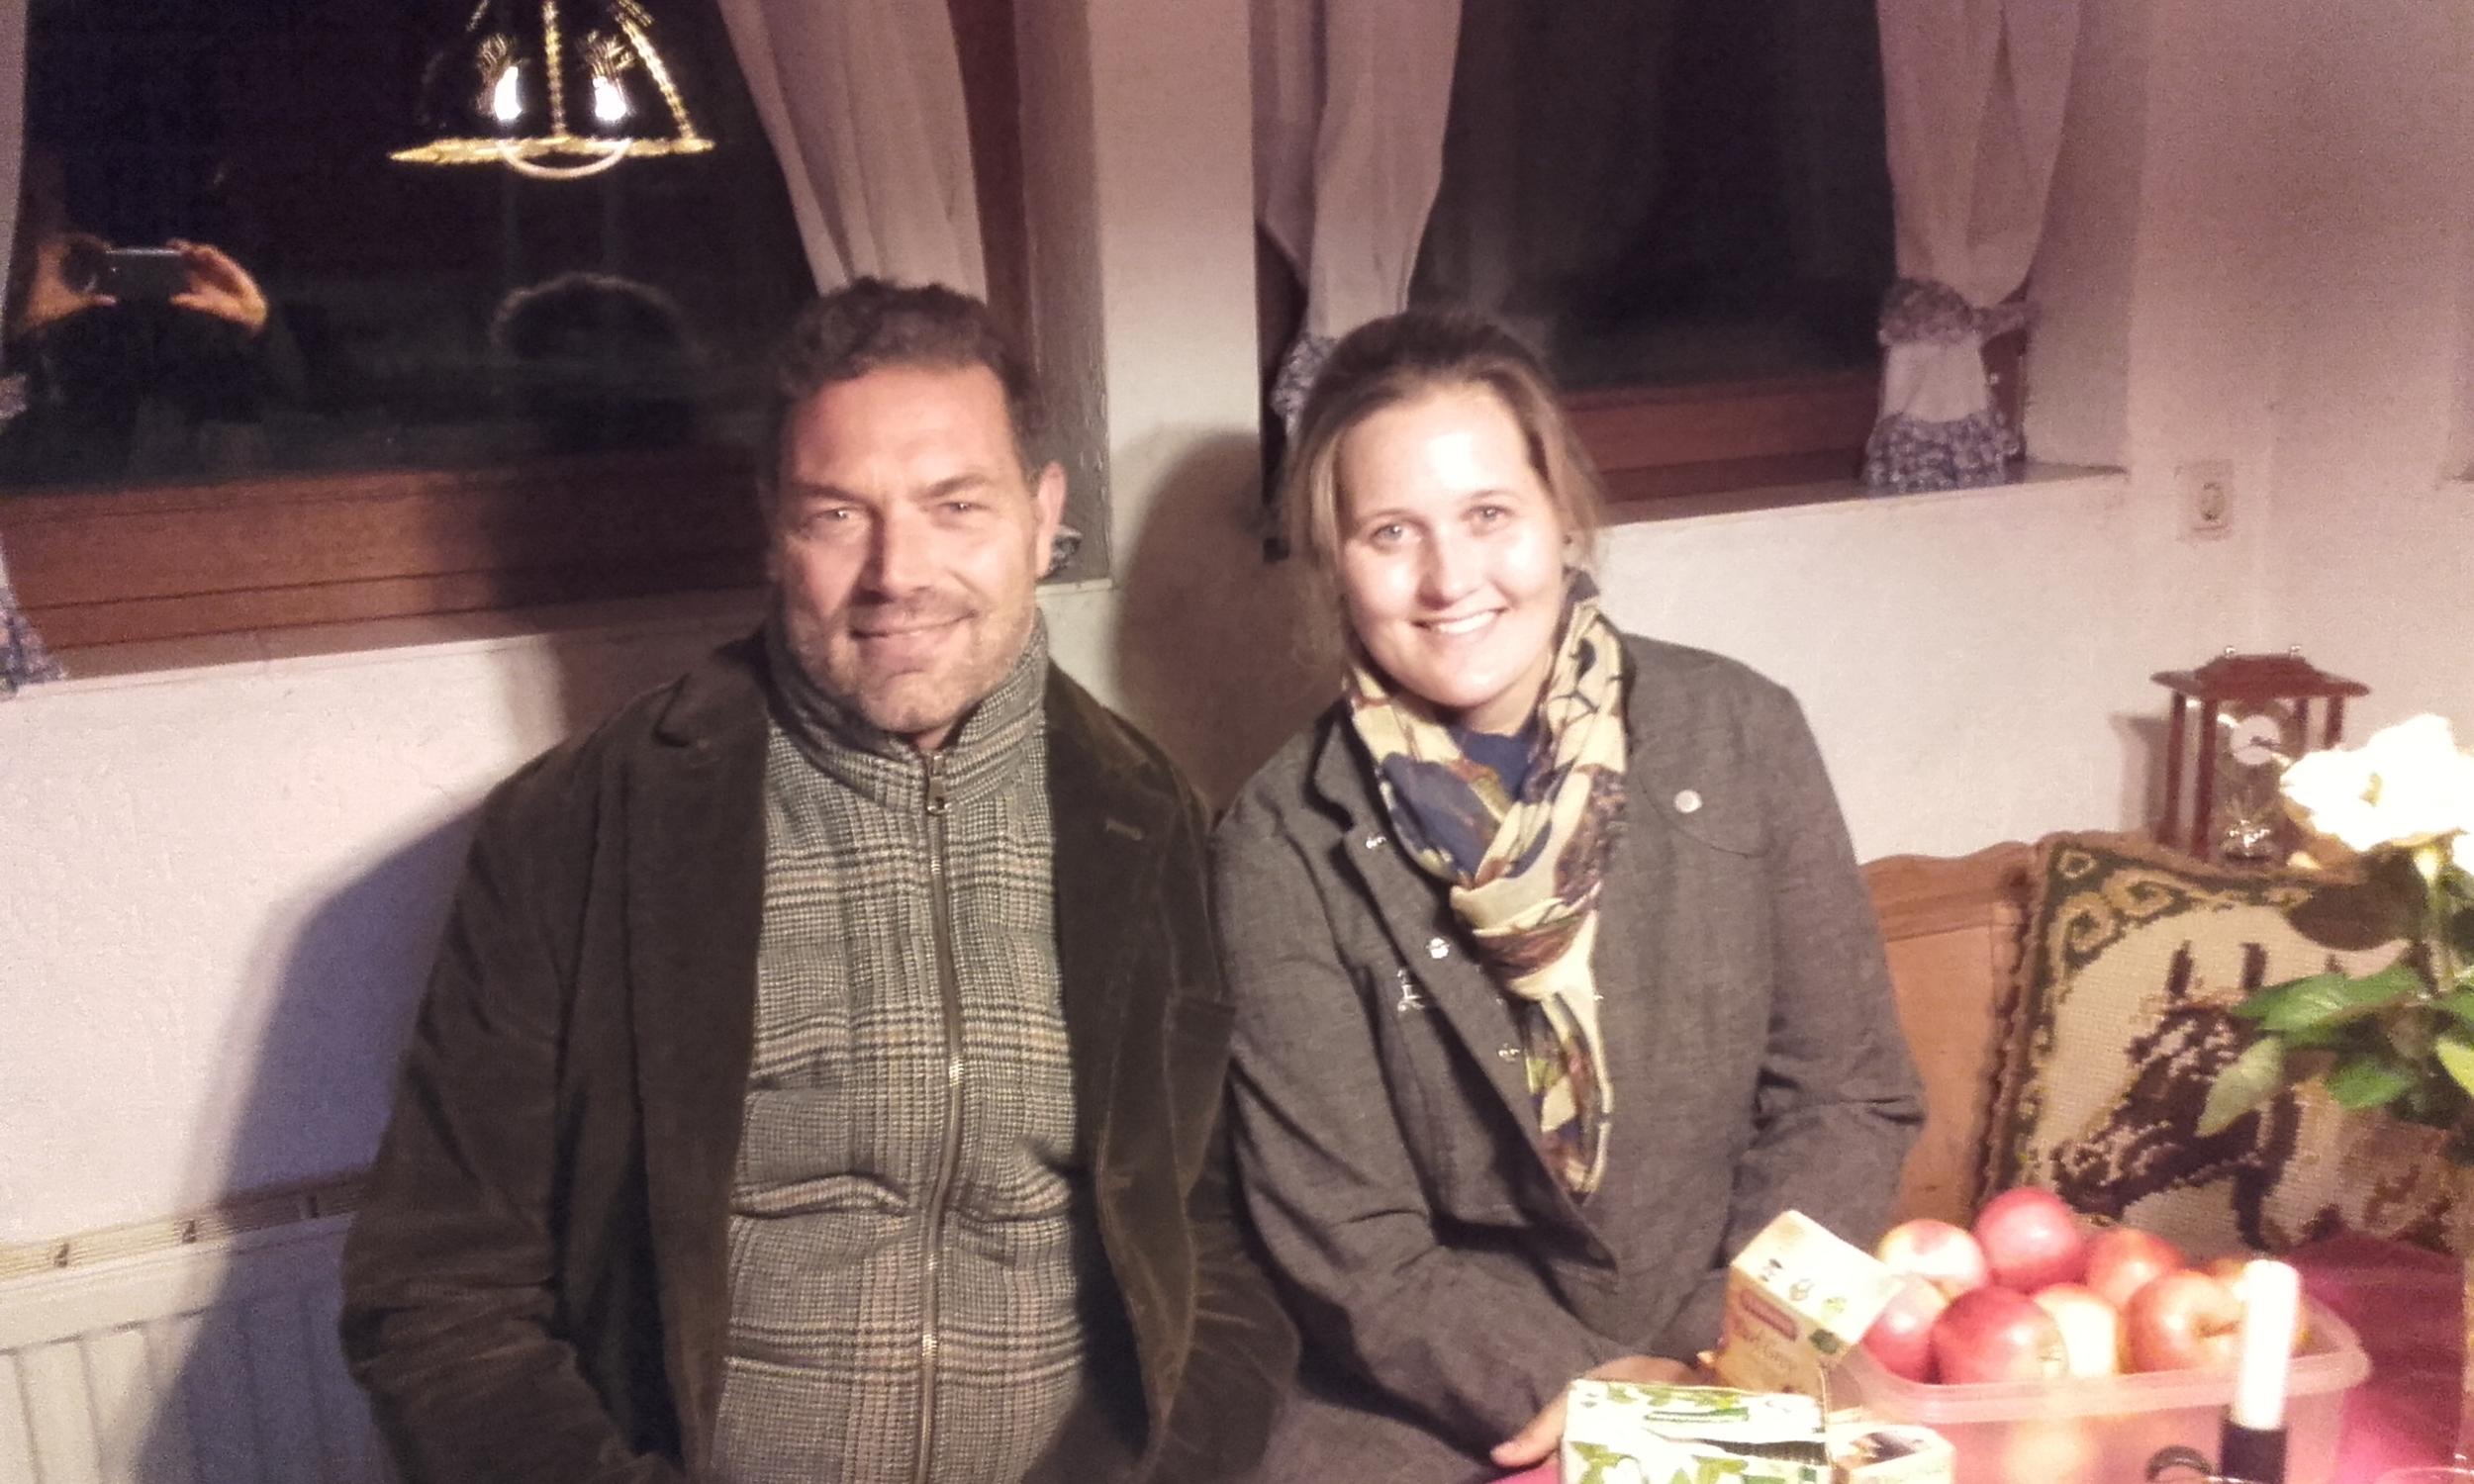 David and I at Zirbelhof, just outside of Aachen.